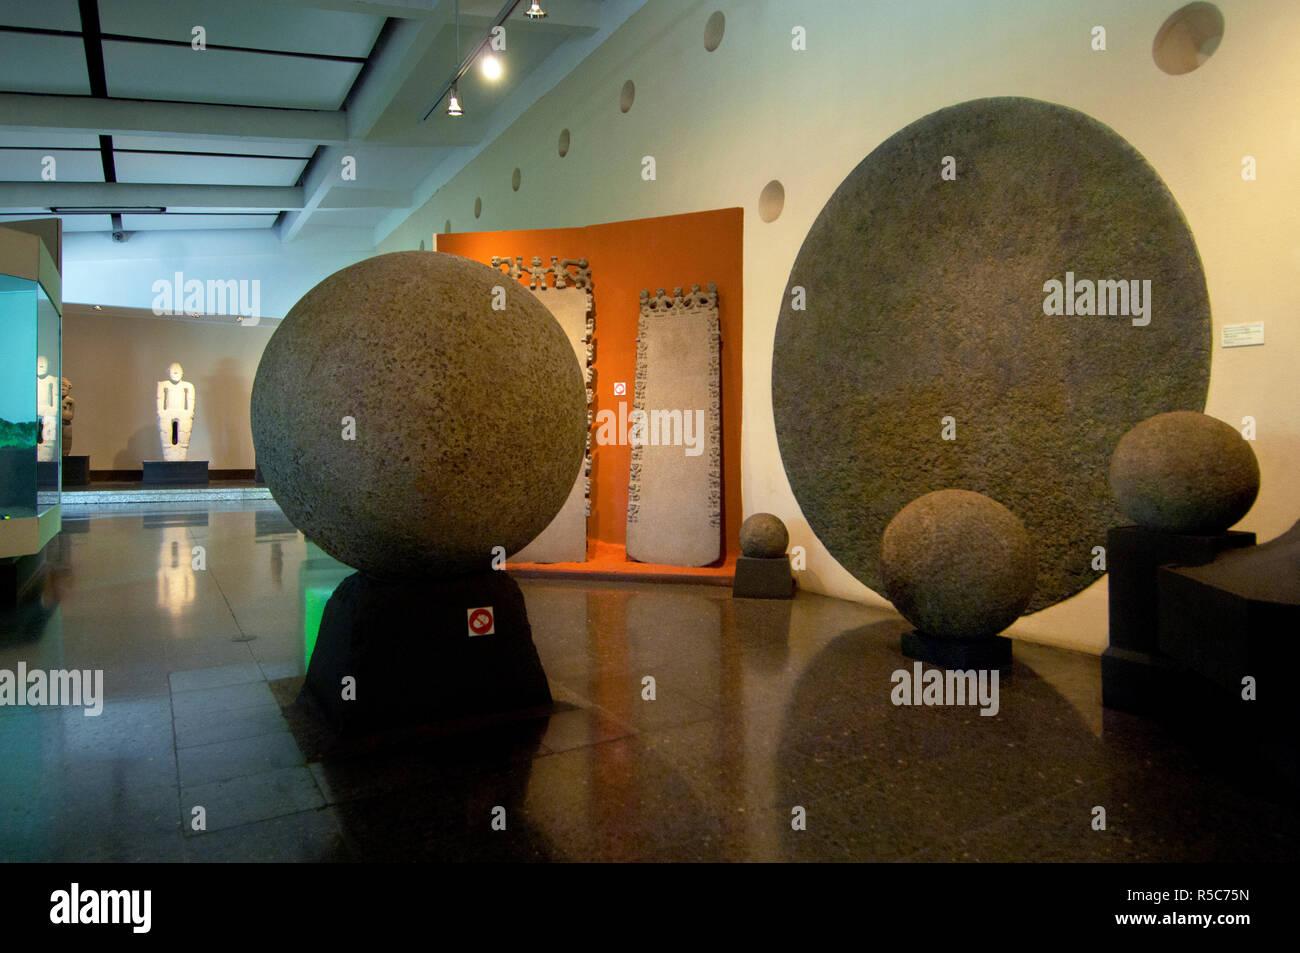 Costa Rica, San Jose, National Museum, Original Spherical Pre-Colombian Stone Display, Costa Rican Cultural Identity - Stock Image